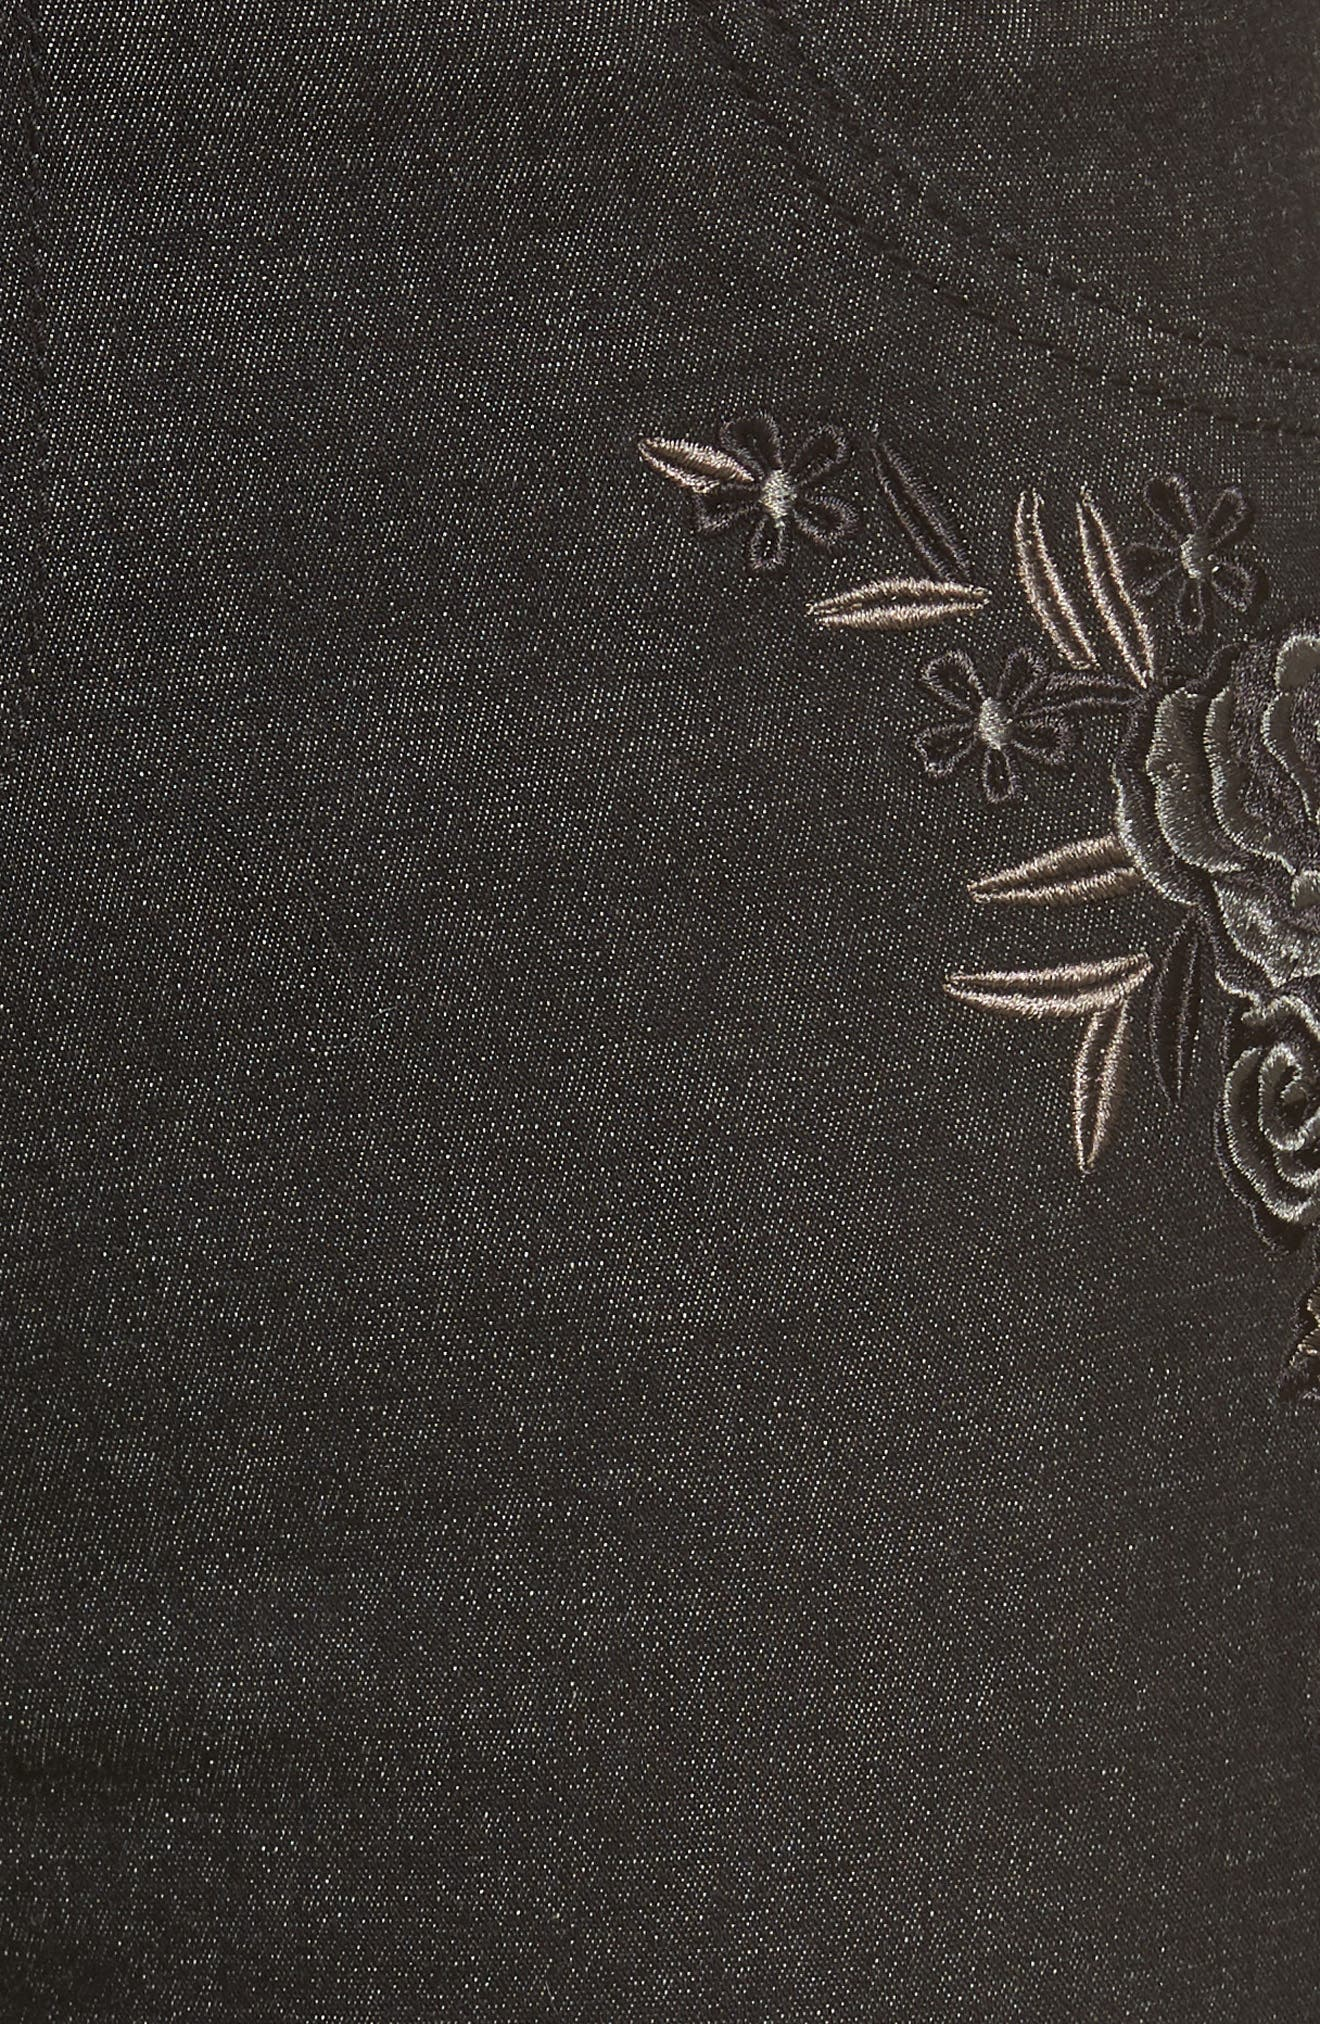 Embroidered Crop Denim Leggings,                             Alternate thumbnail 5, color,                             BLACK